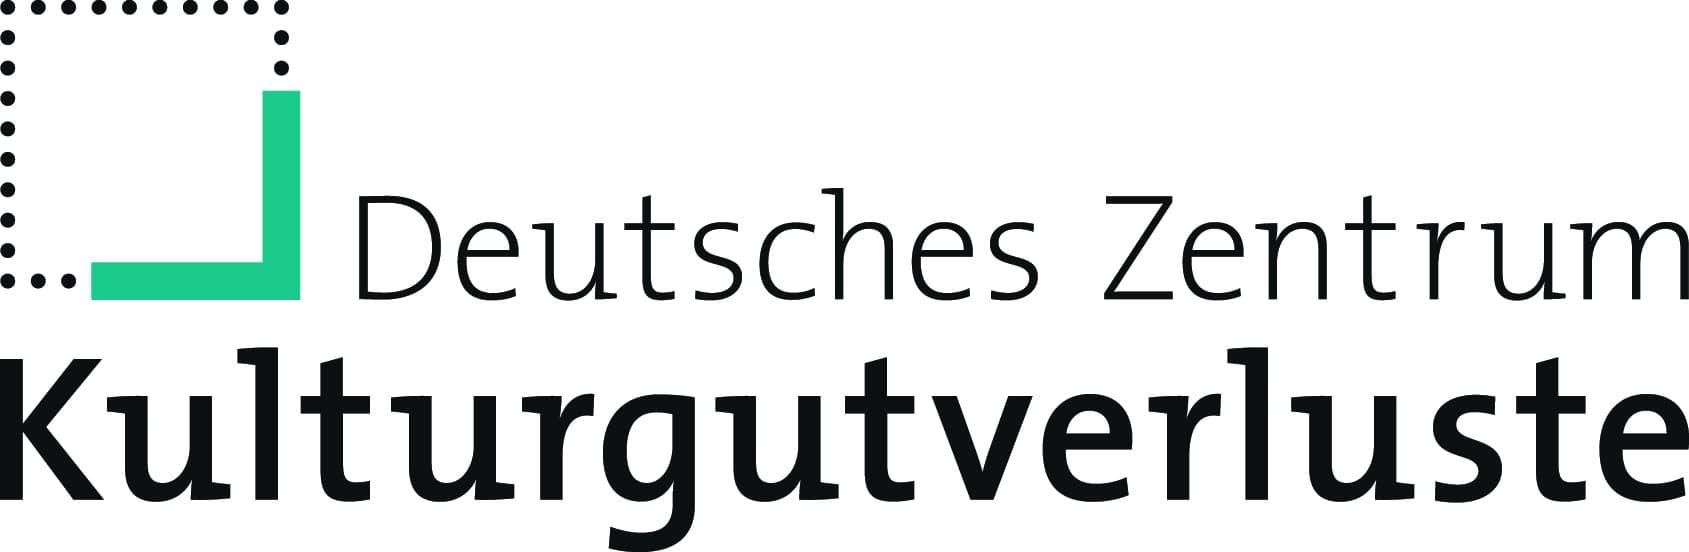 Logo Deutsches Zentrum Kulturgutverlustee